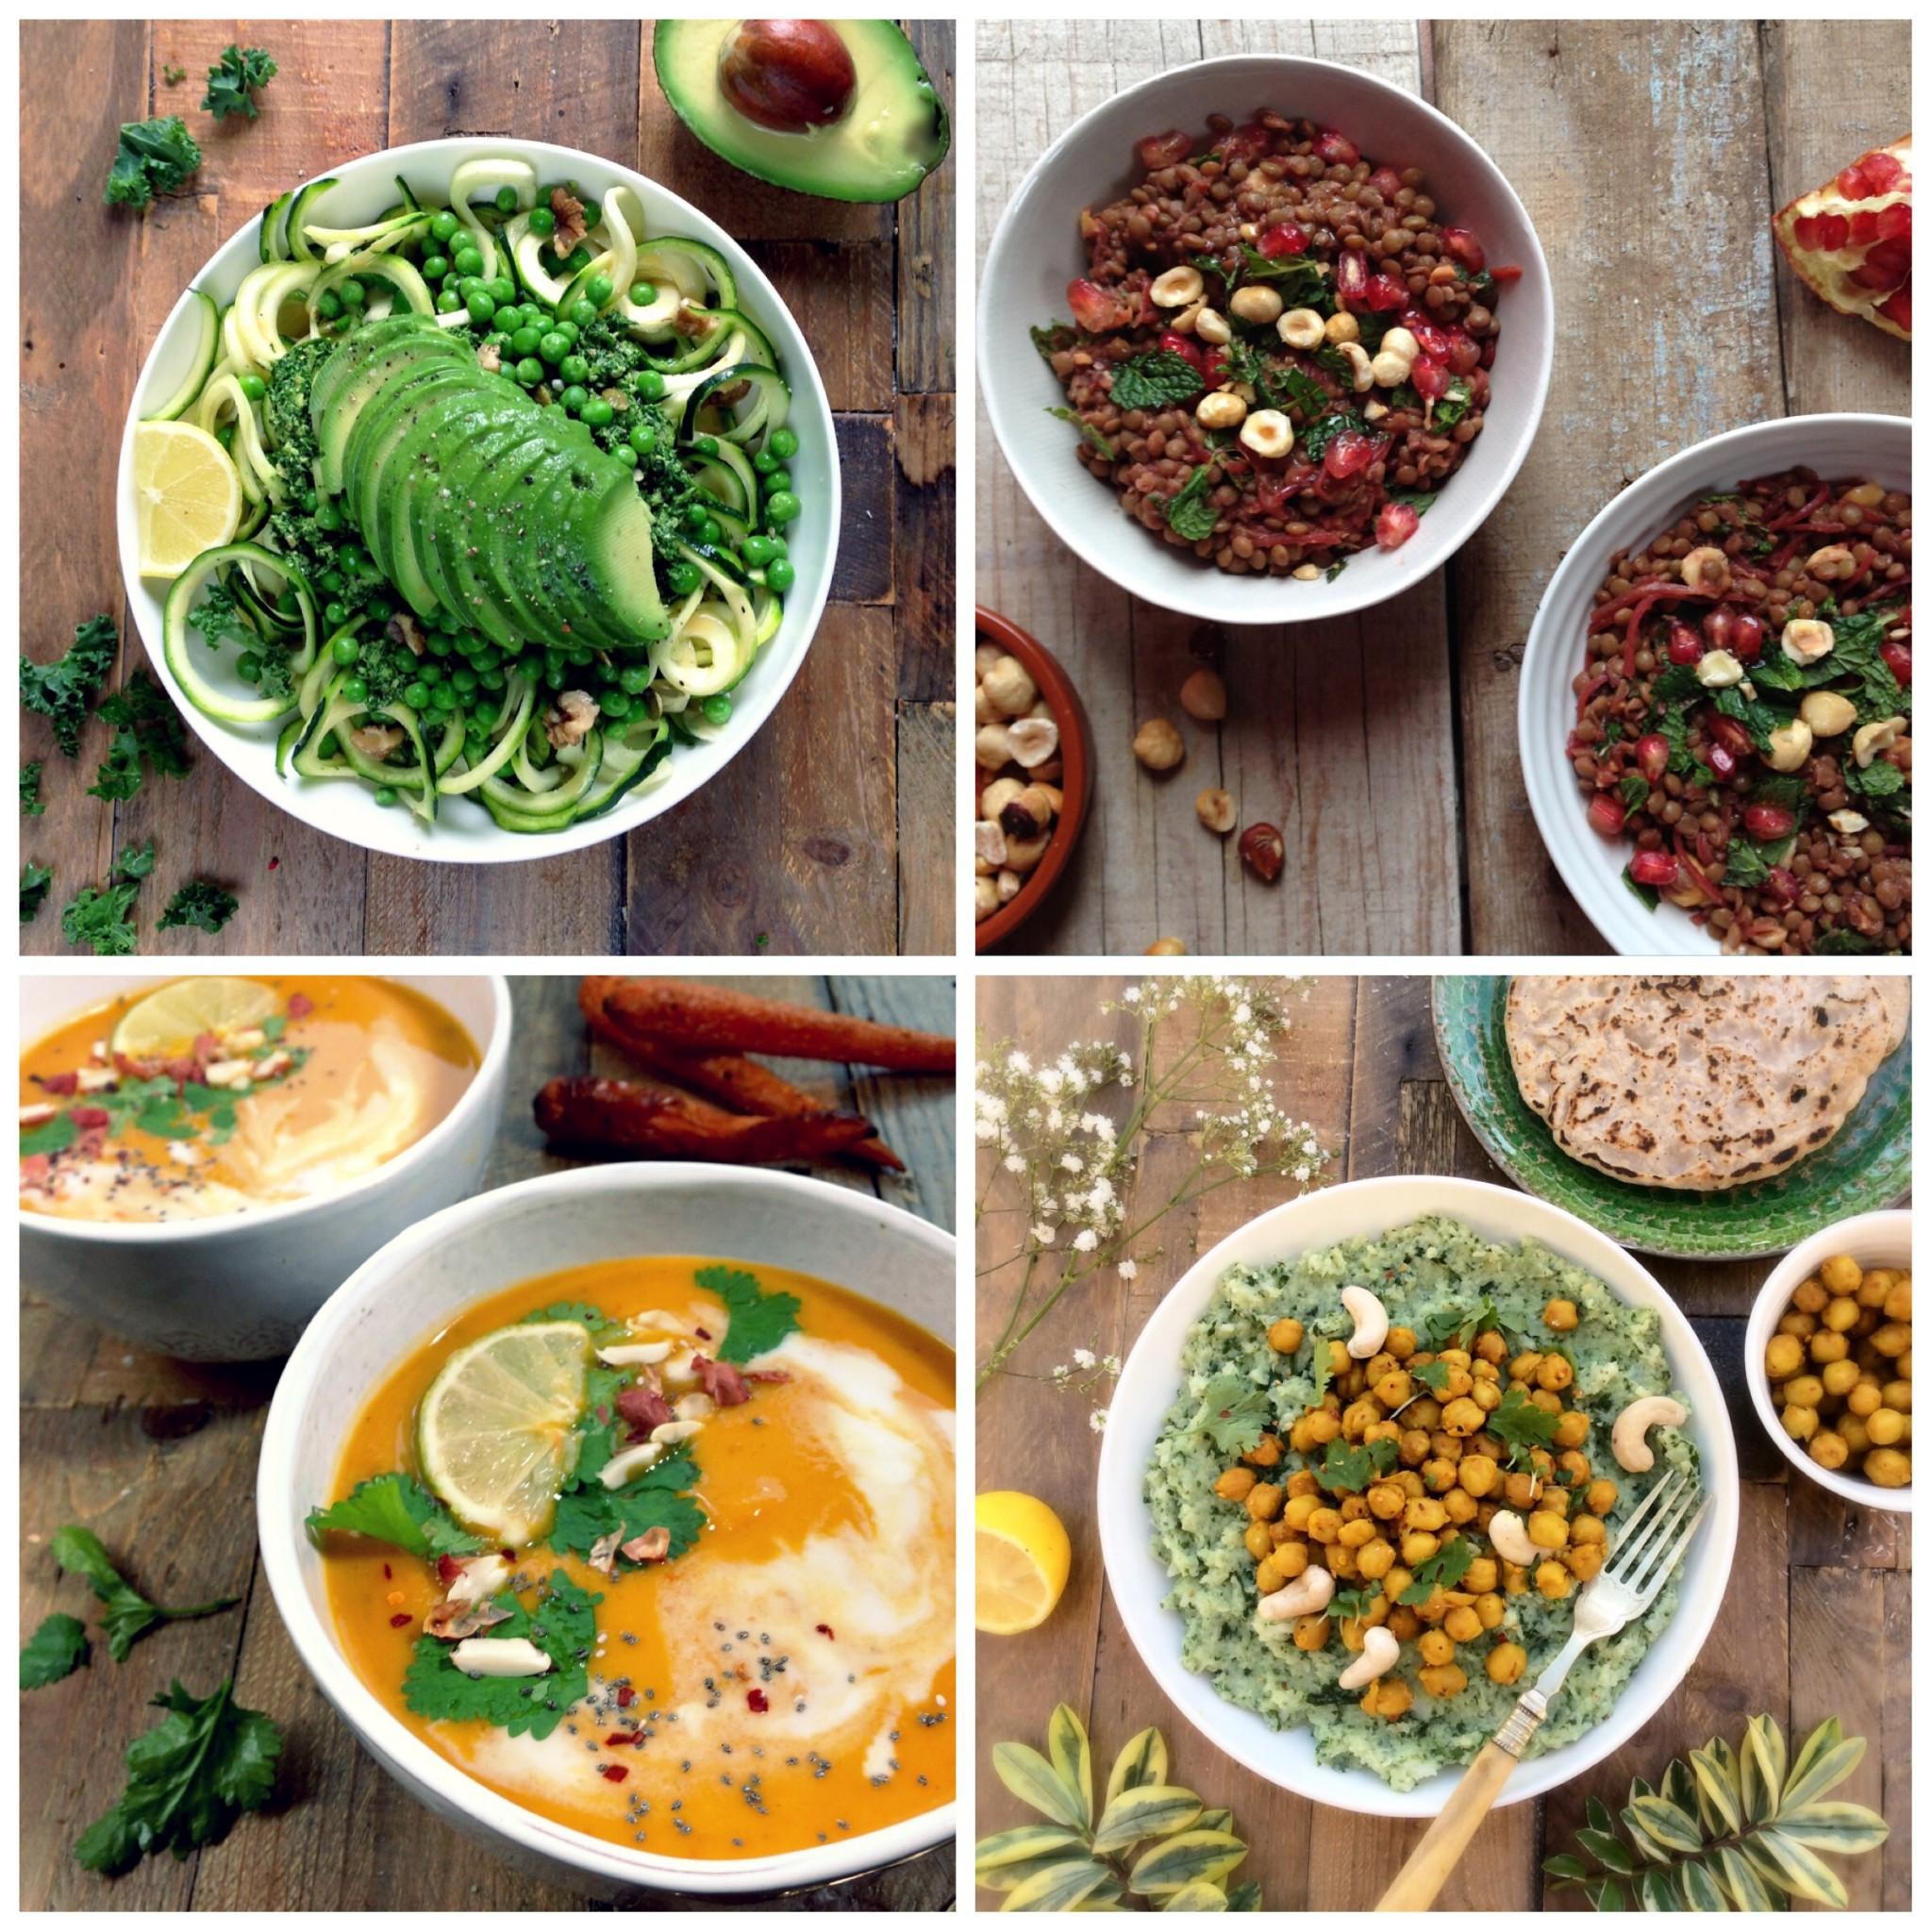 Vegan Recipes For Dinner  Top Ten Healthy and Light Vegan Dinners